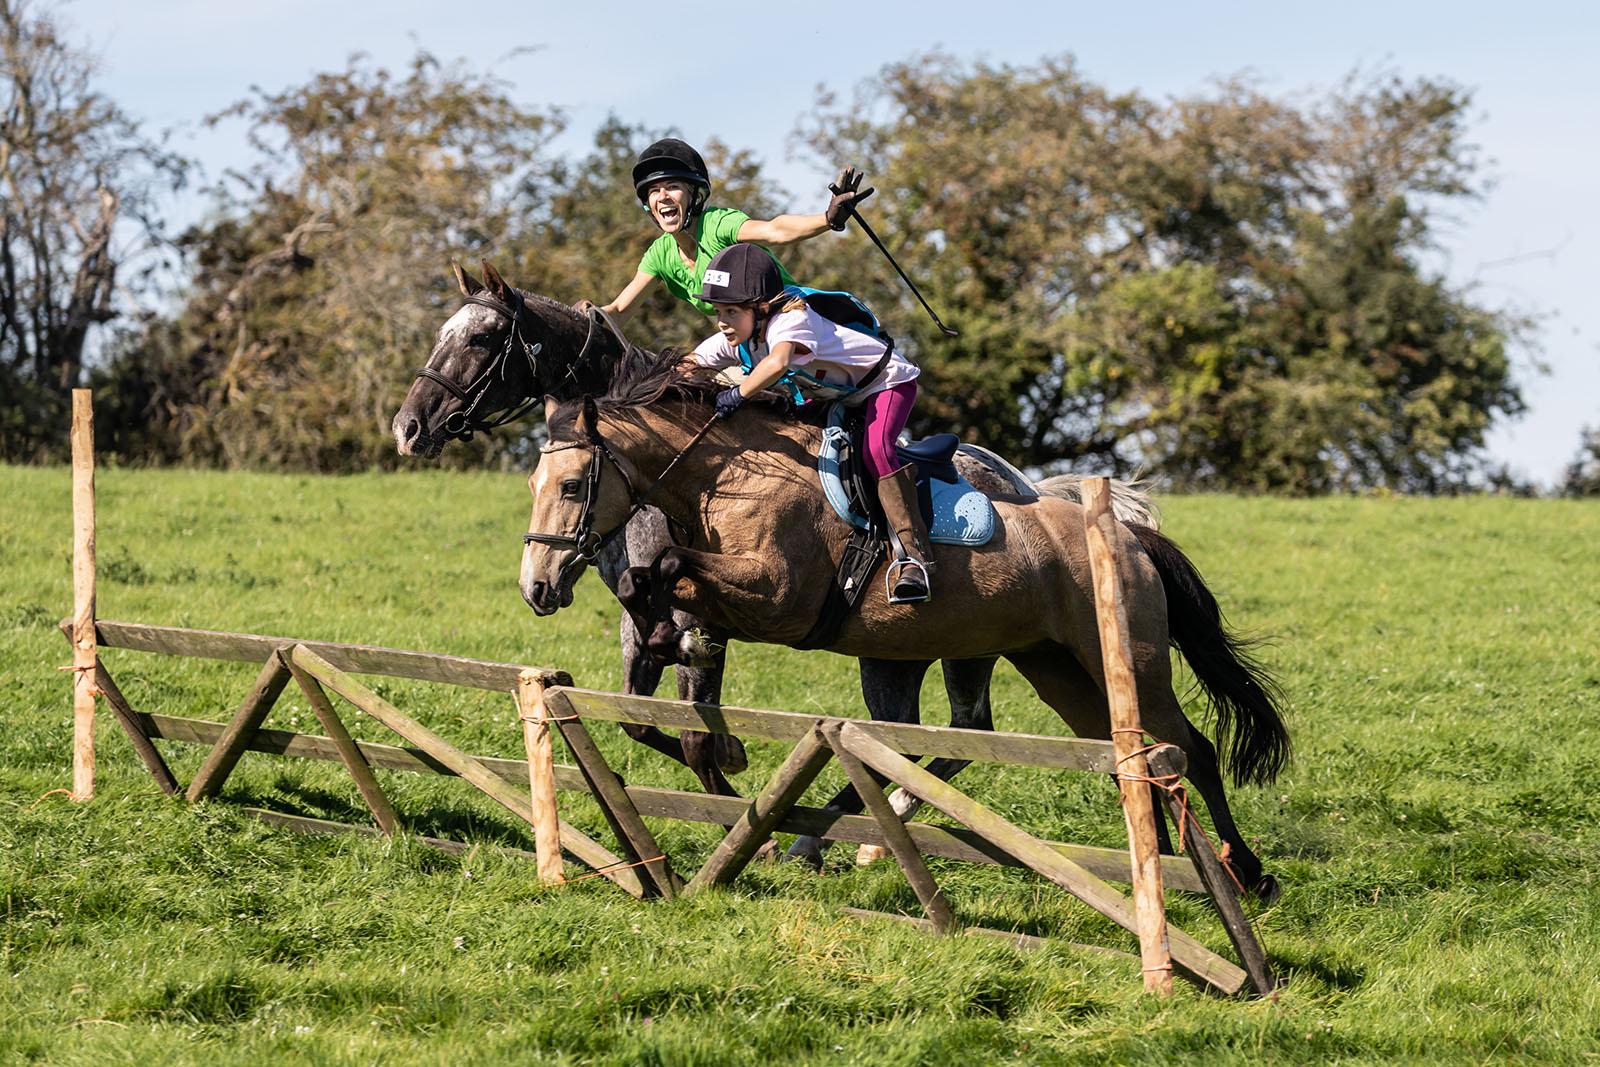 Coakham_Bloodhounds__Charity_ride_2019-1751